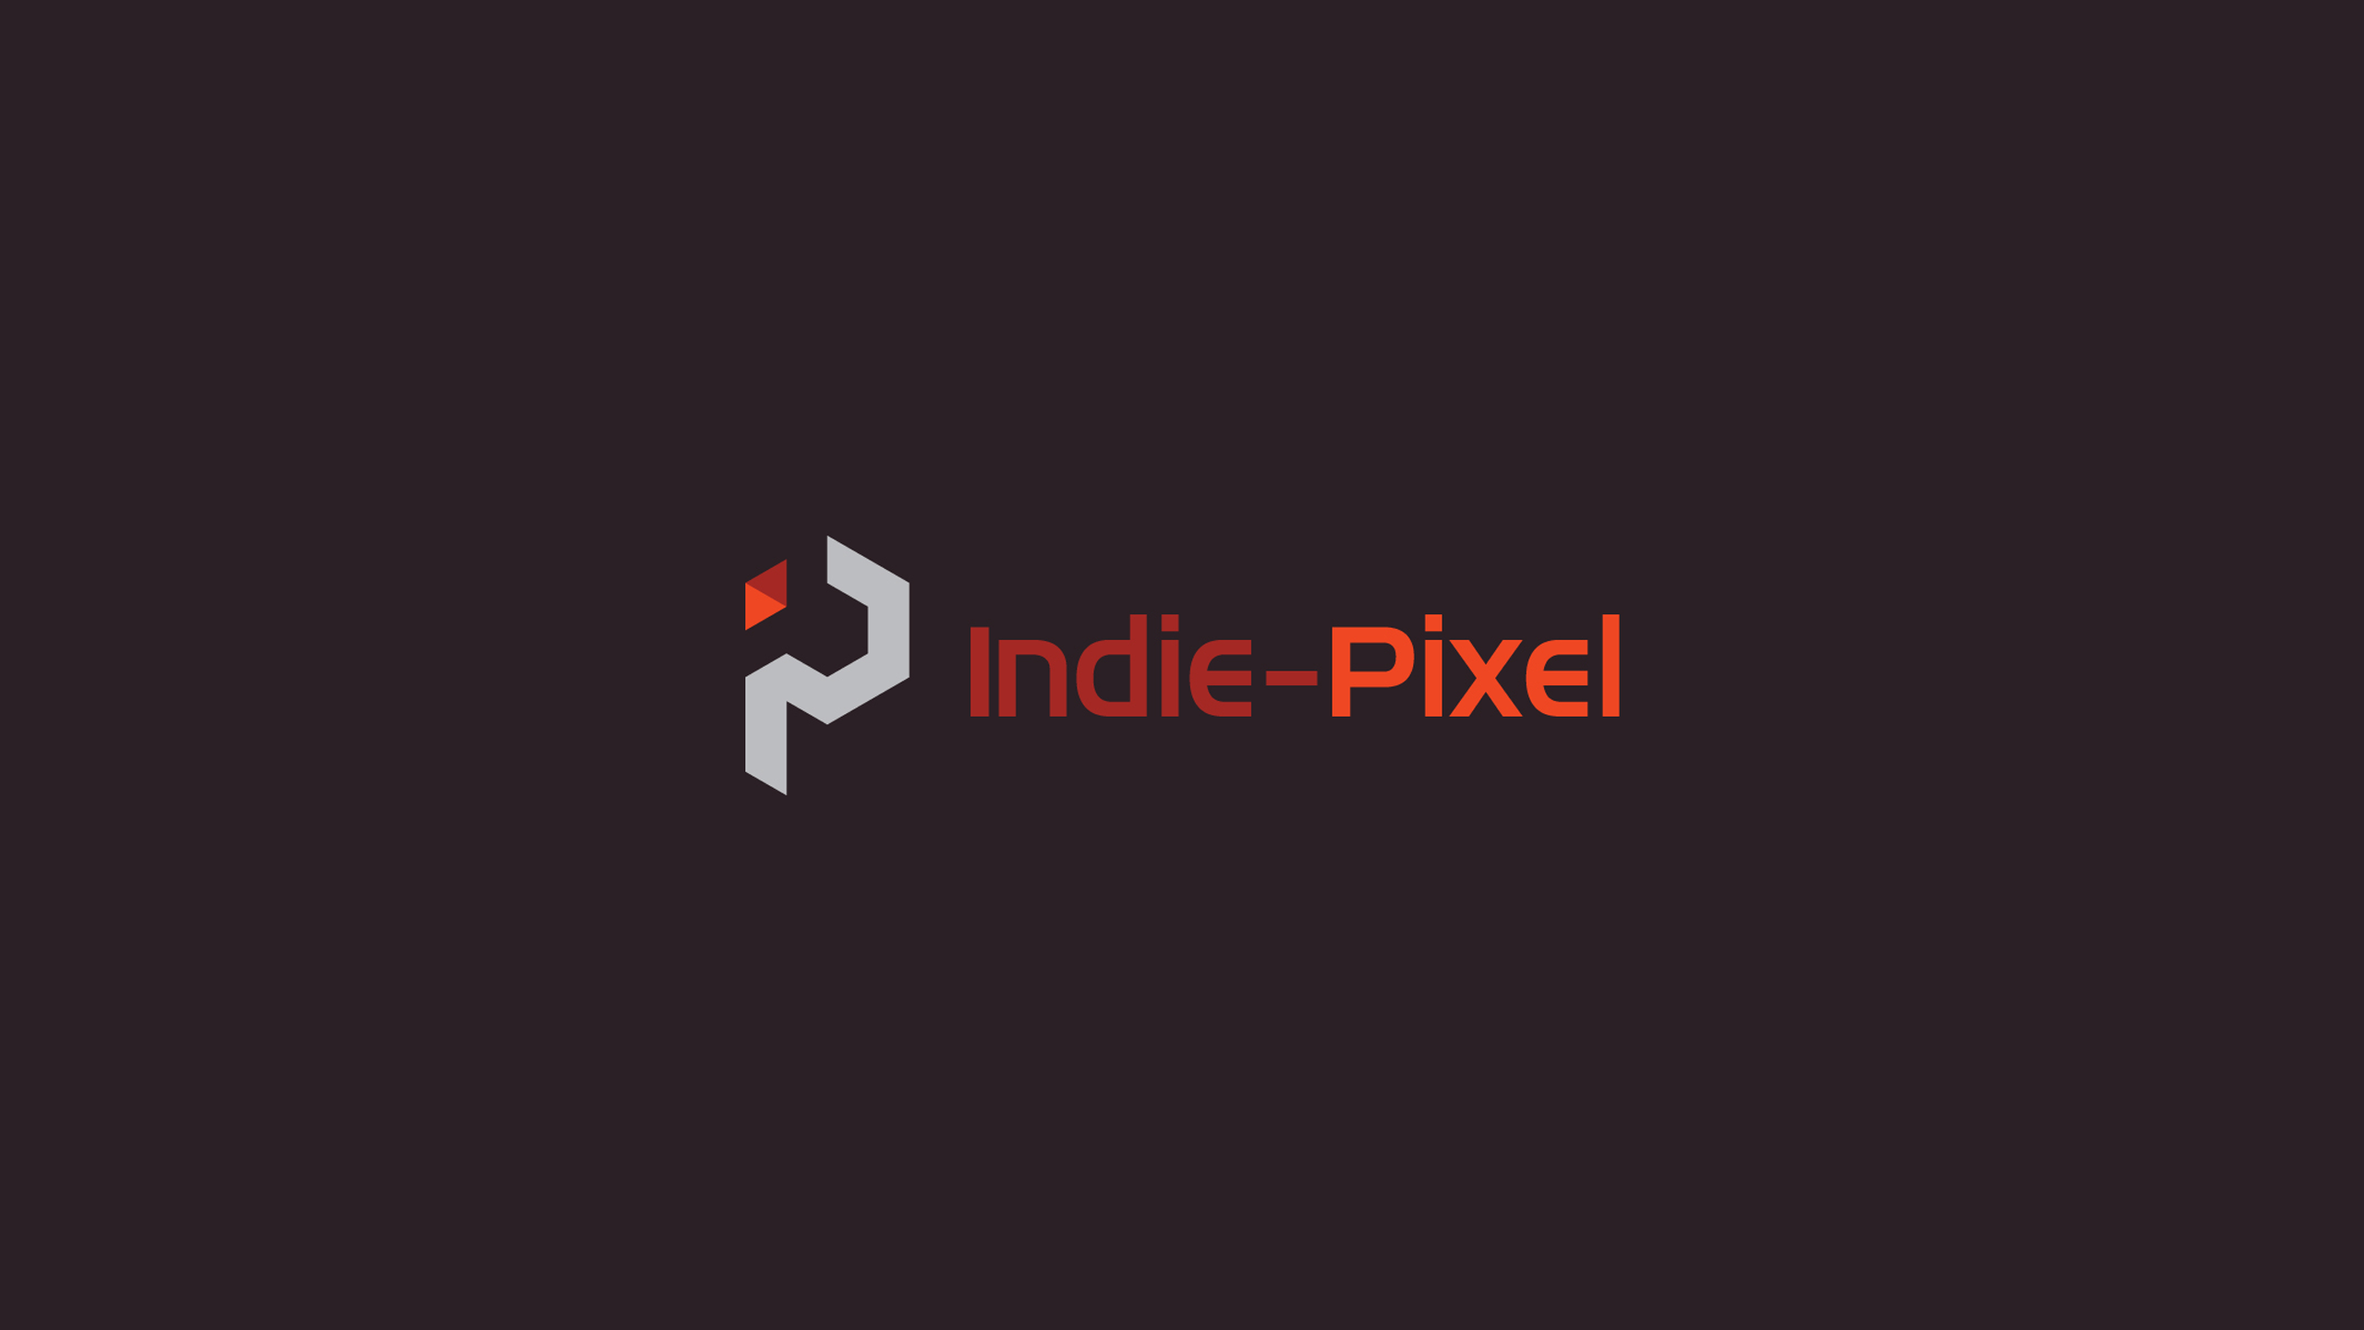 Houdini Tutorials | Unity Tutorials | Indie-Pixel